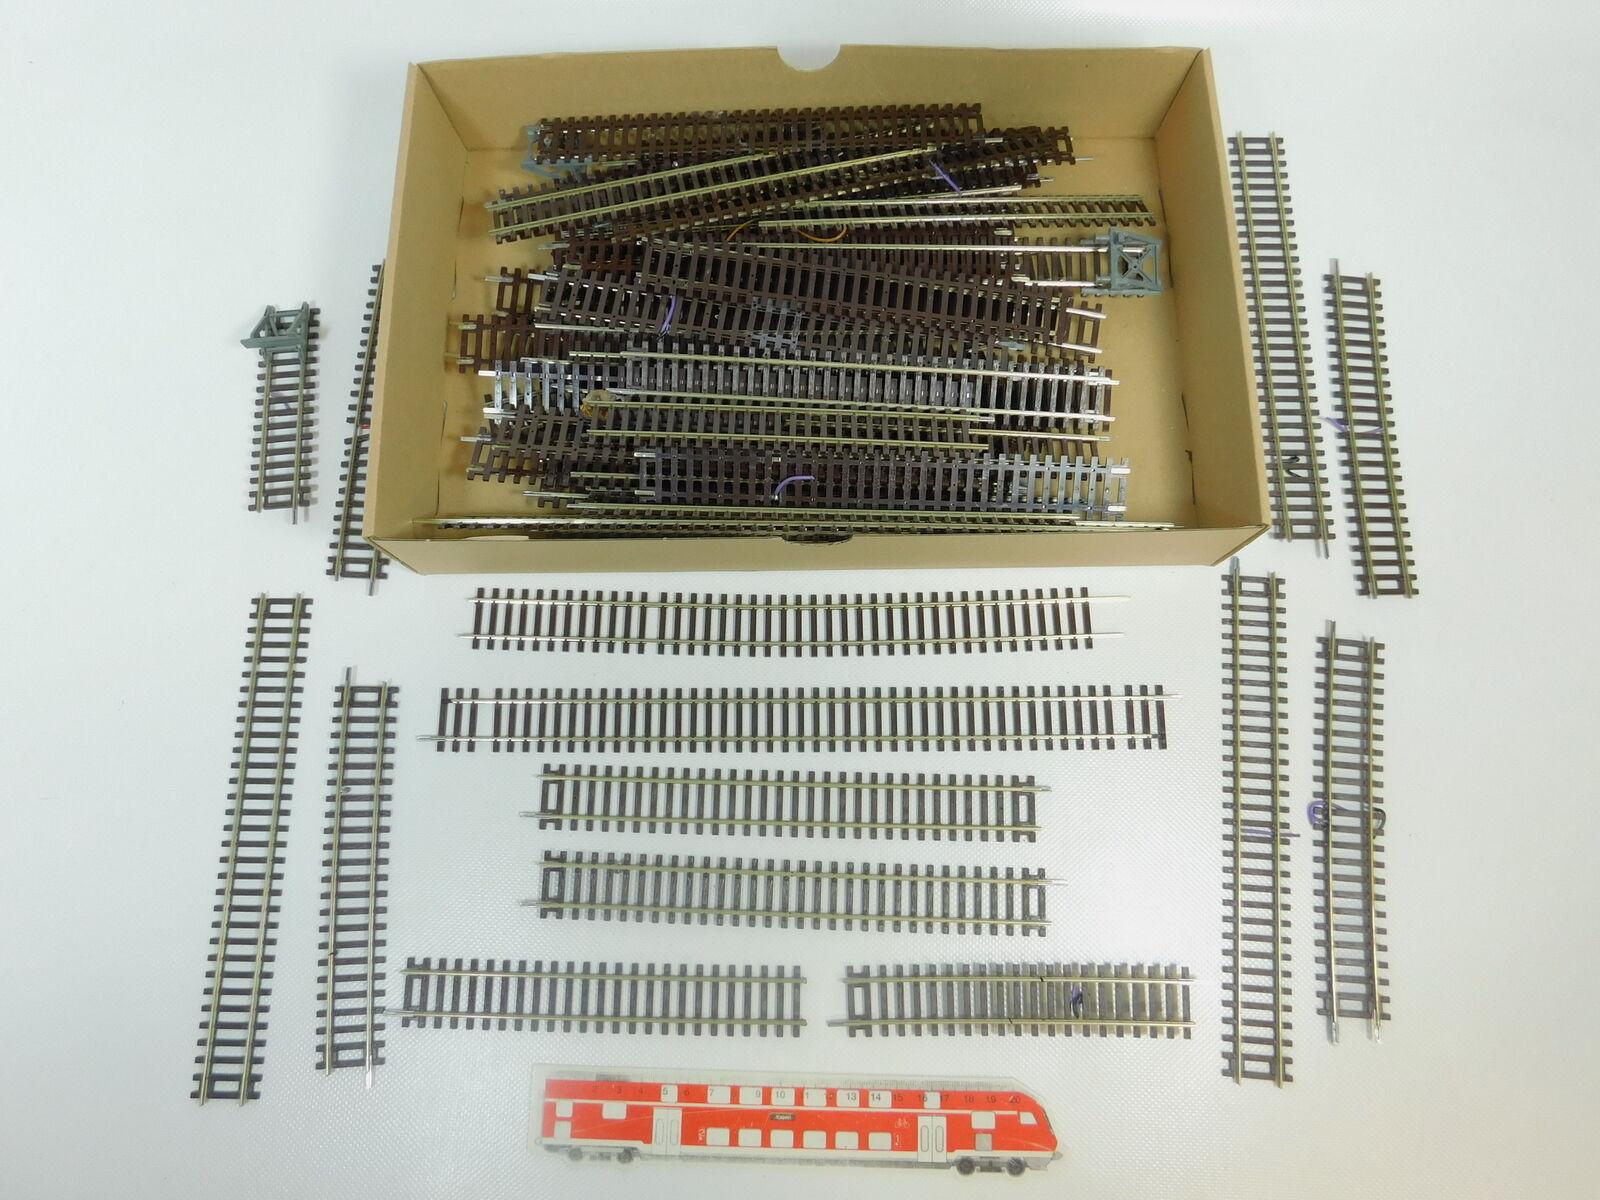 Bn909-2 x h0 DC roco straight path  42410 +42430 +42400 etc., Crafts